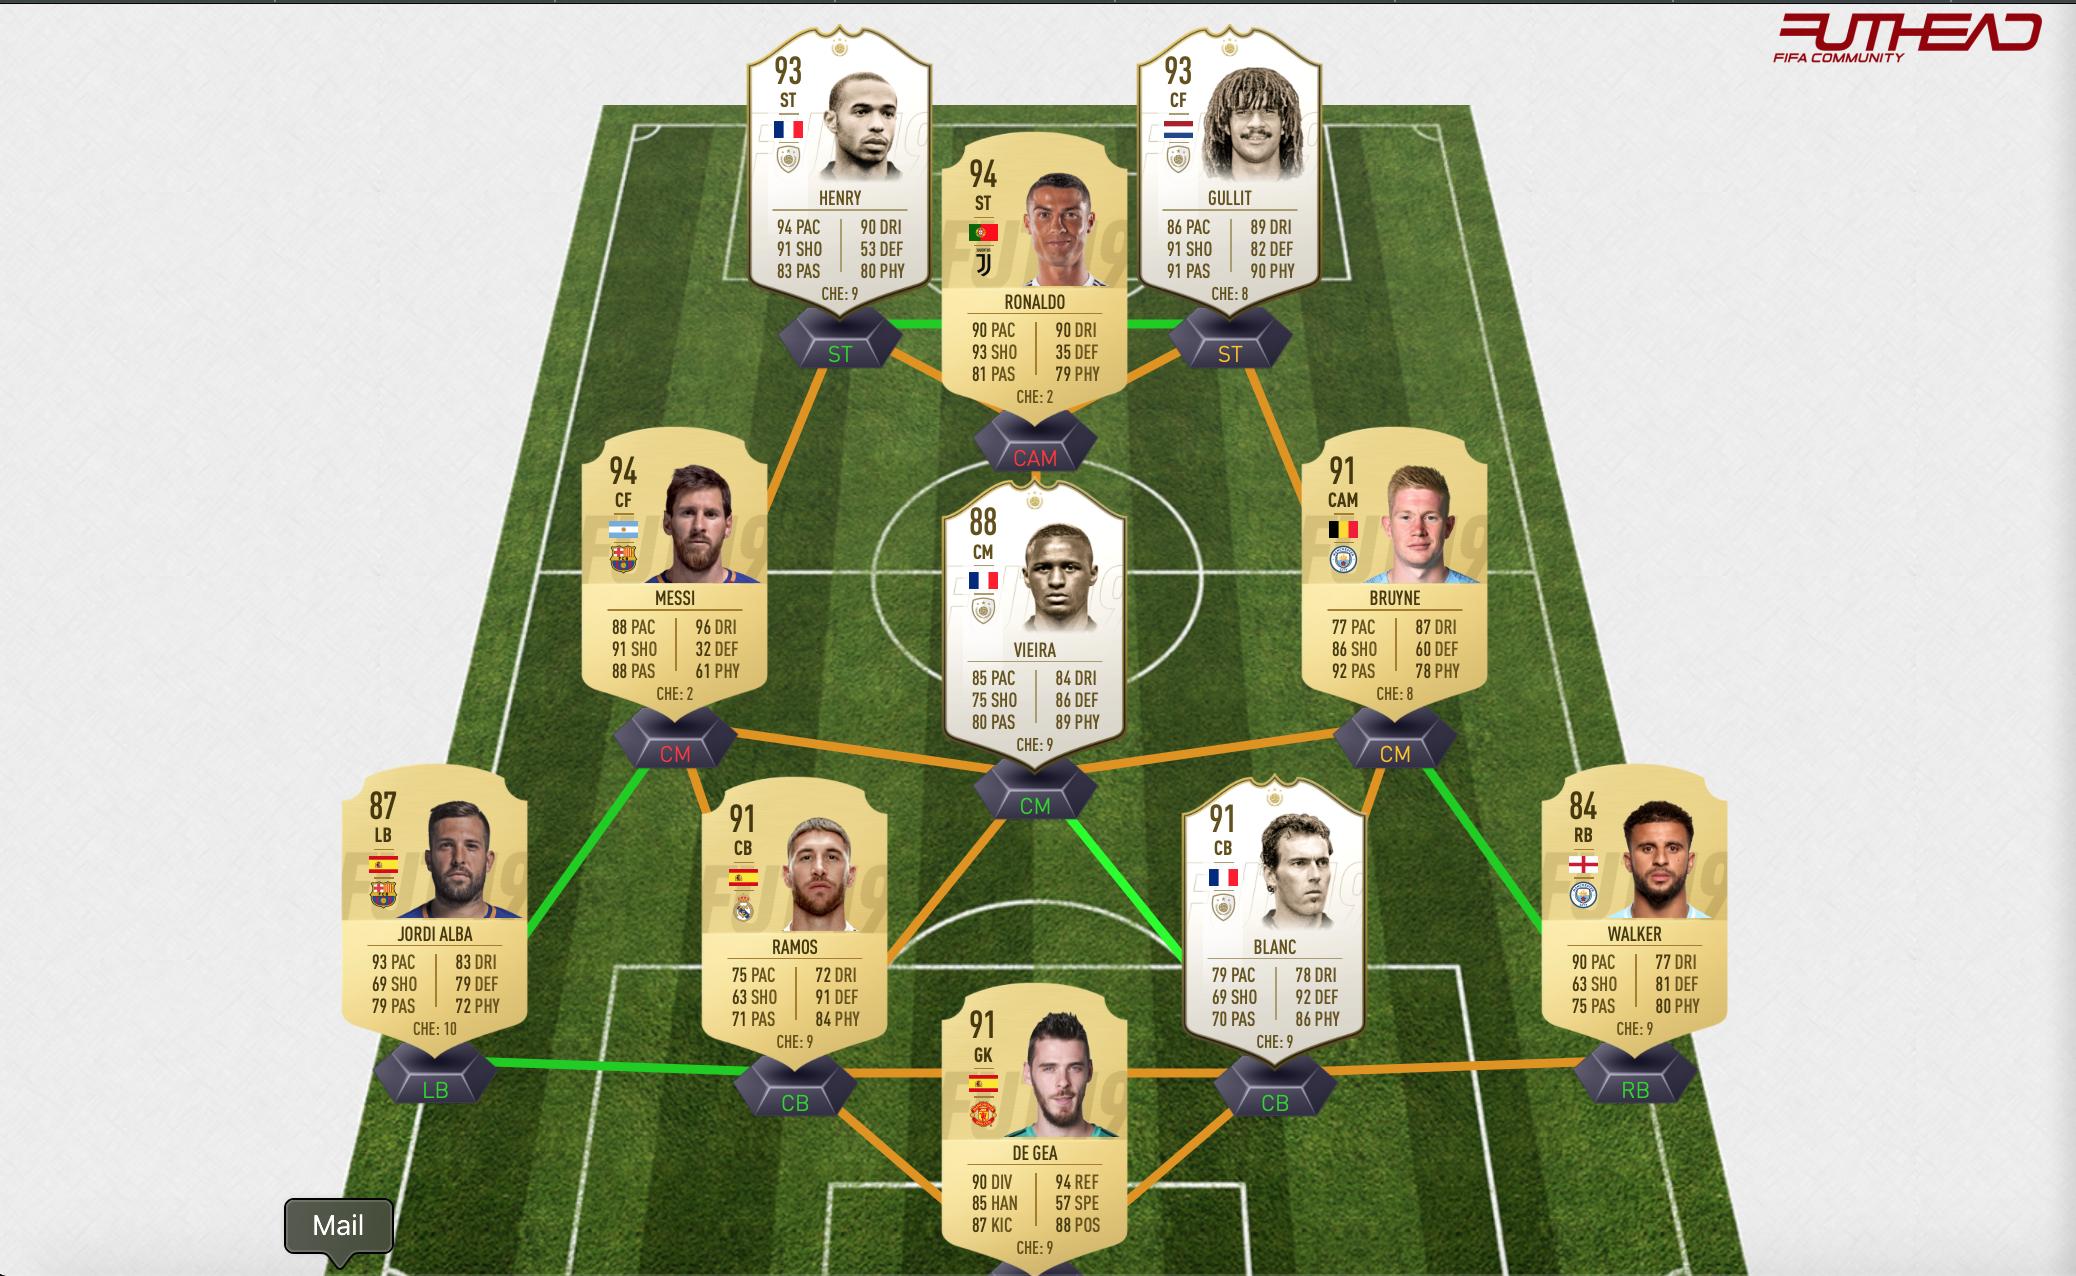 Agge FIFA 19 team